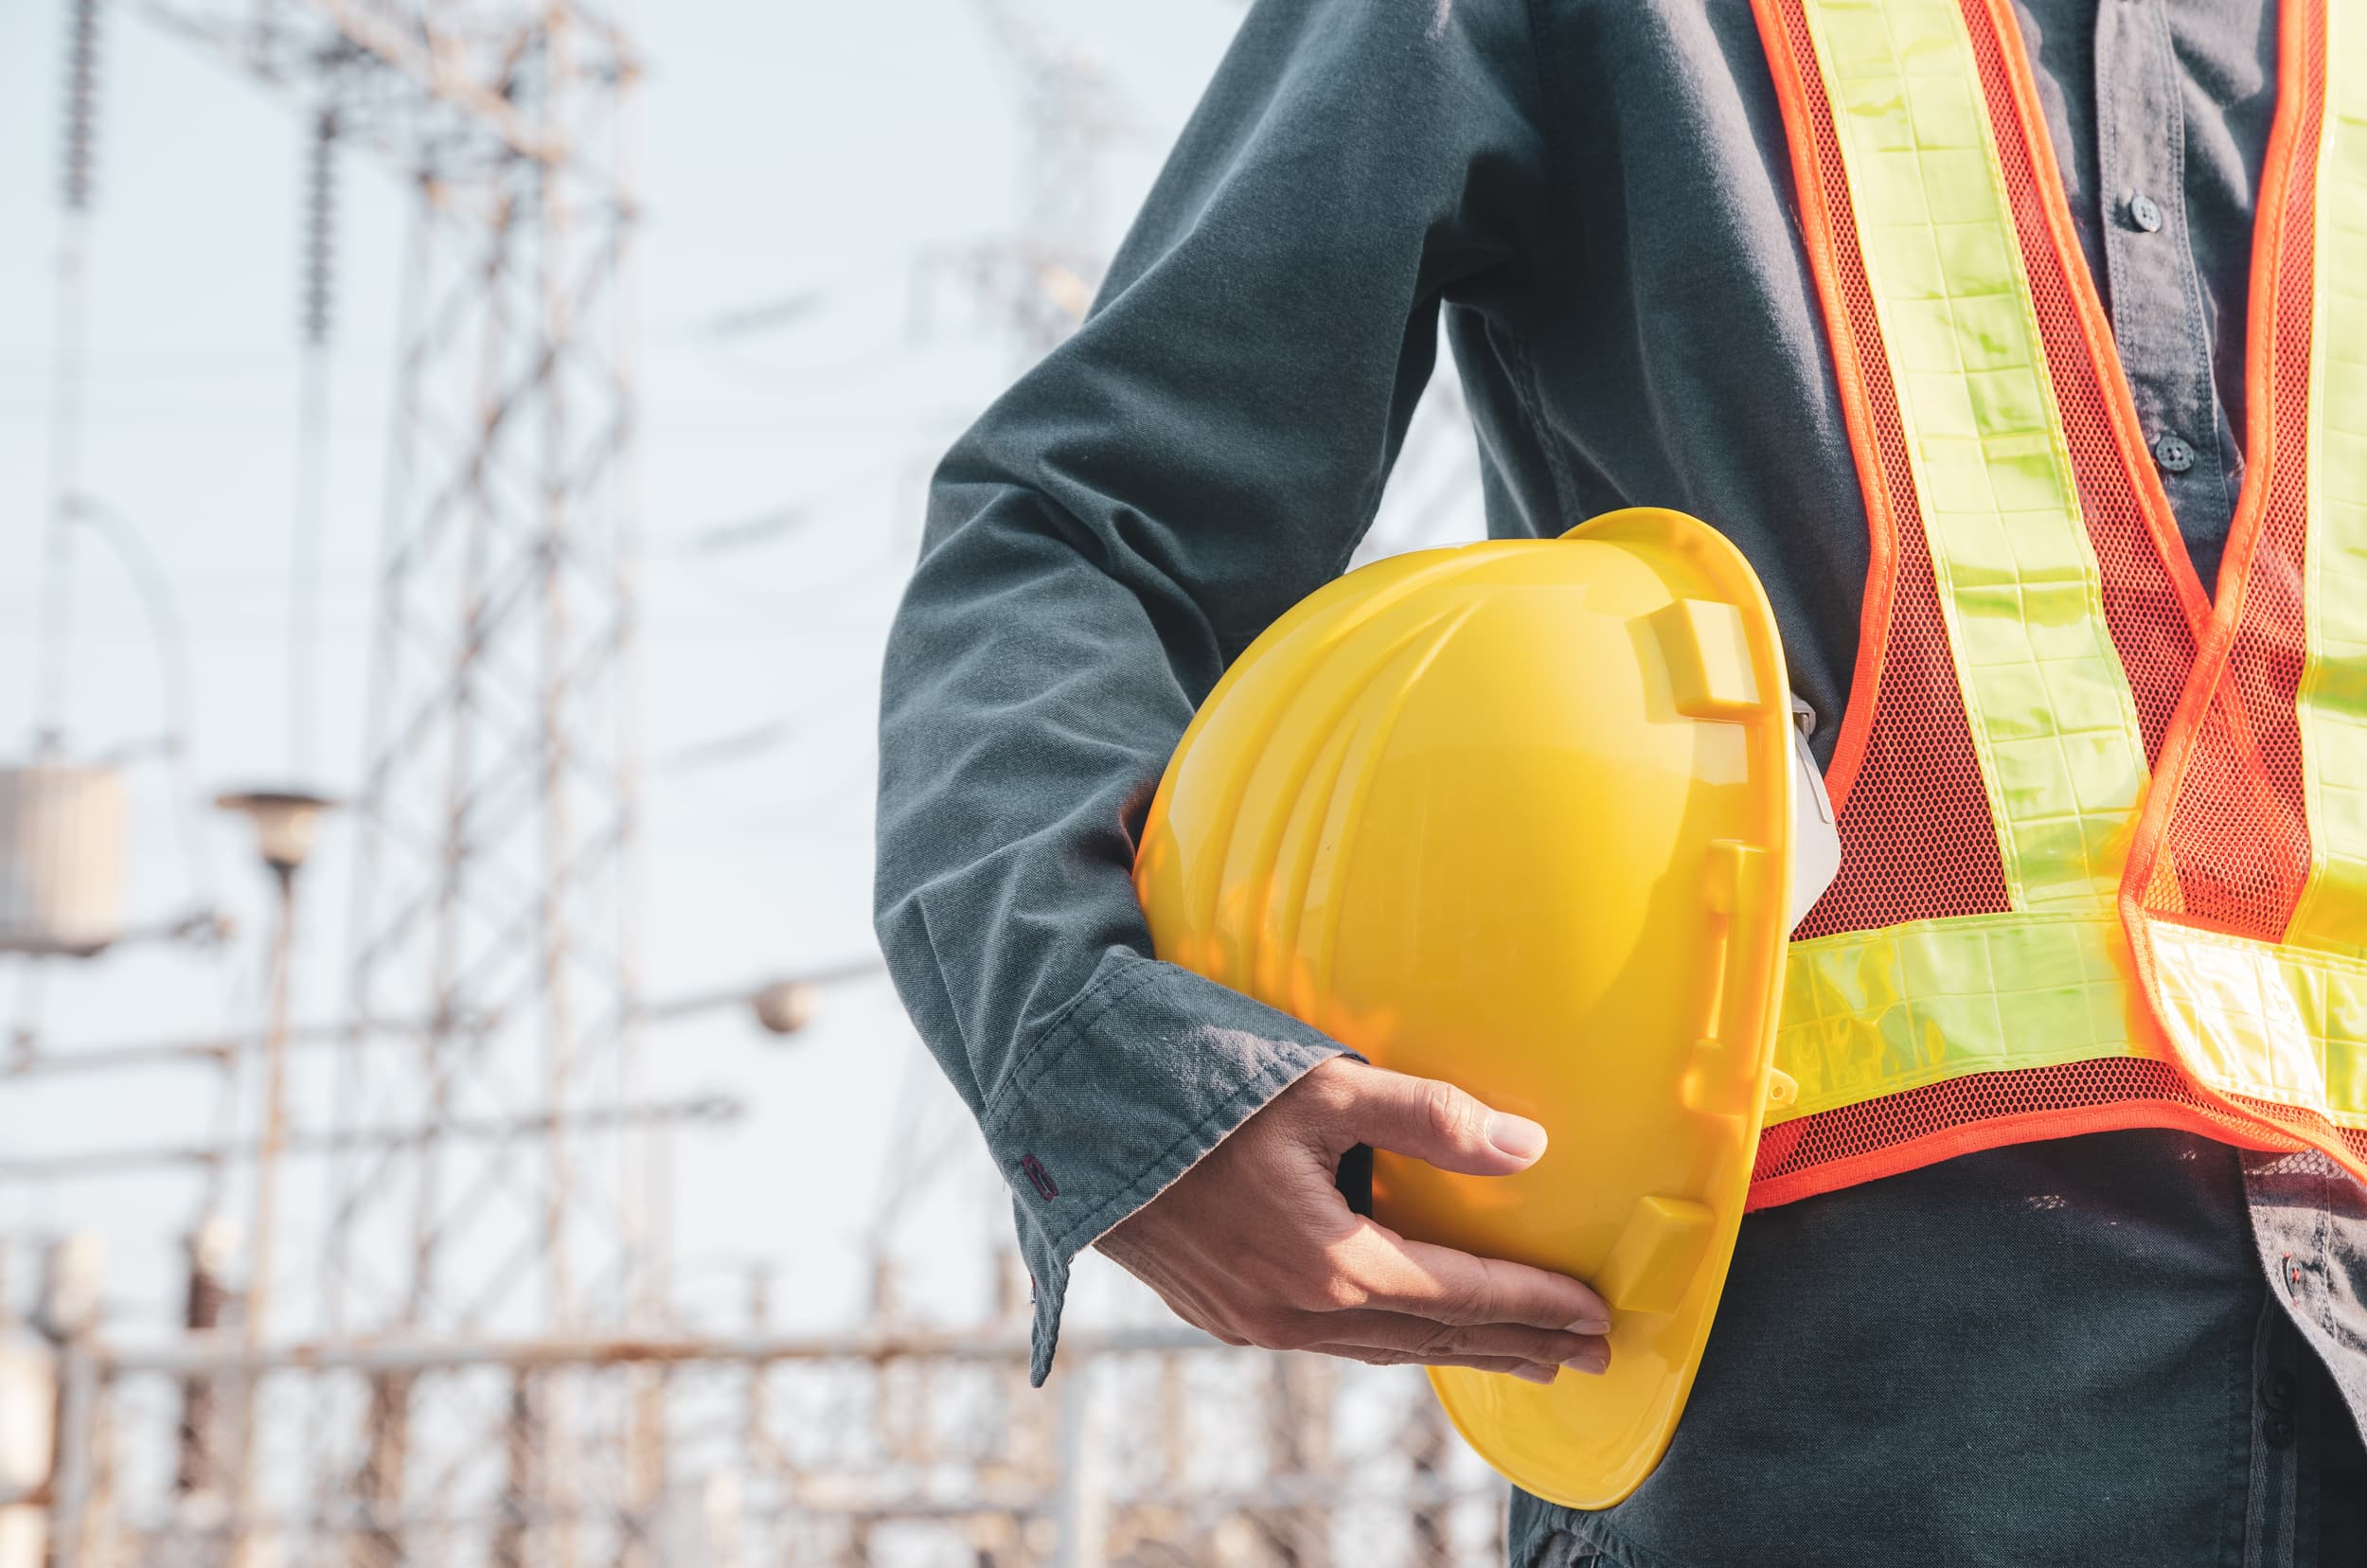 Compliance Training Online Construction Focus Four Safety course